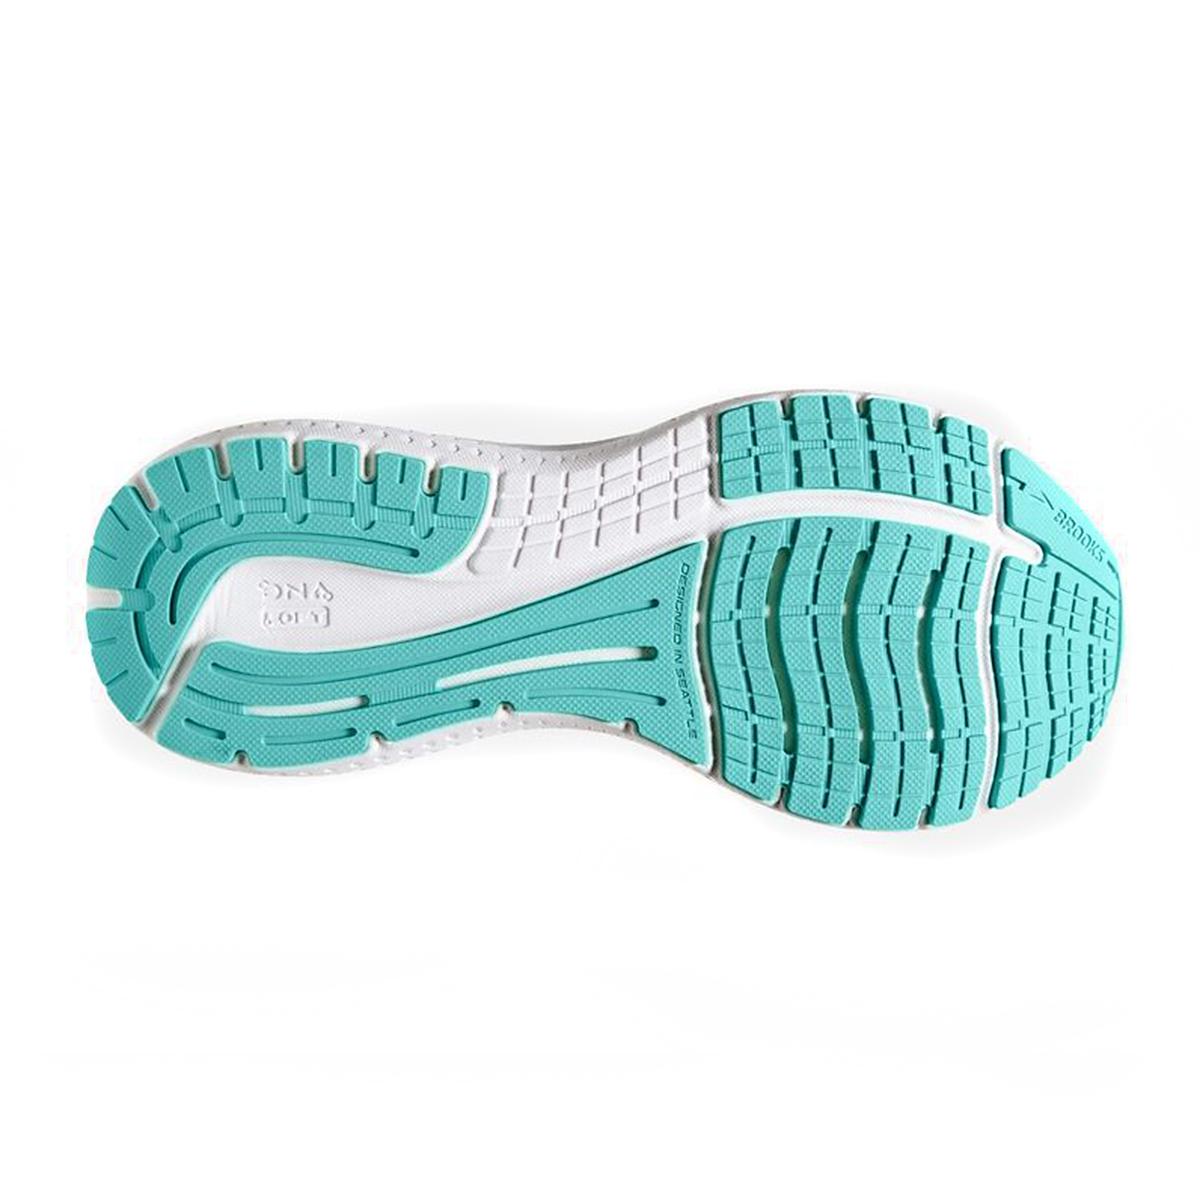 Women's Brooks Glycerin 19 Running Shoe - Color: Nightshadow/Bla - Size: 5 - Width: Regular, Nightshadow/Bla, large, image 6